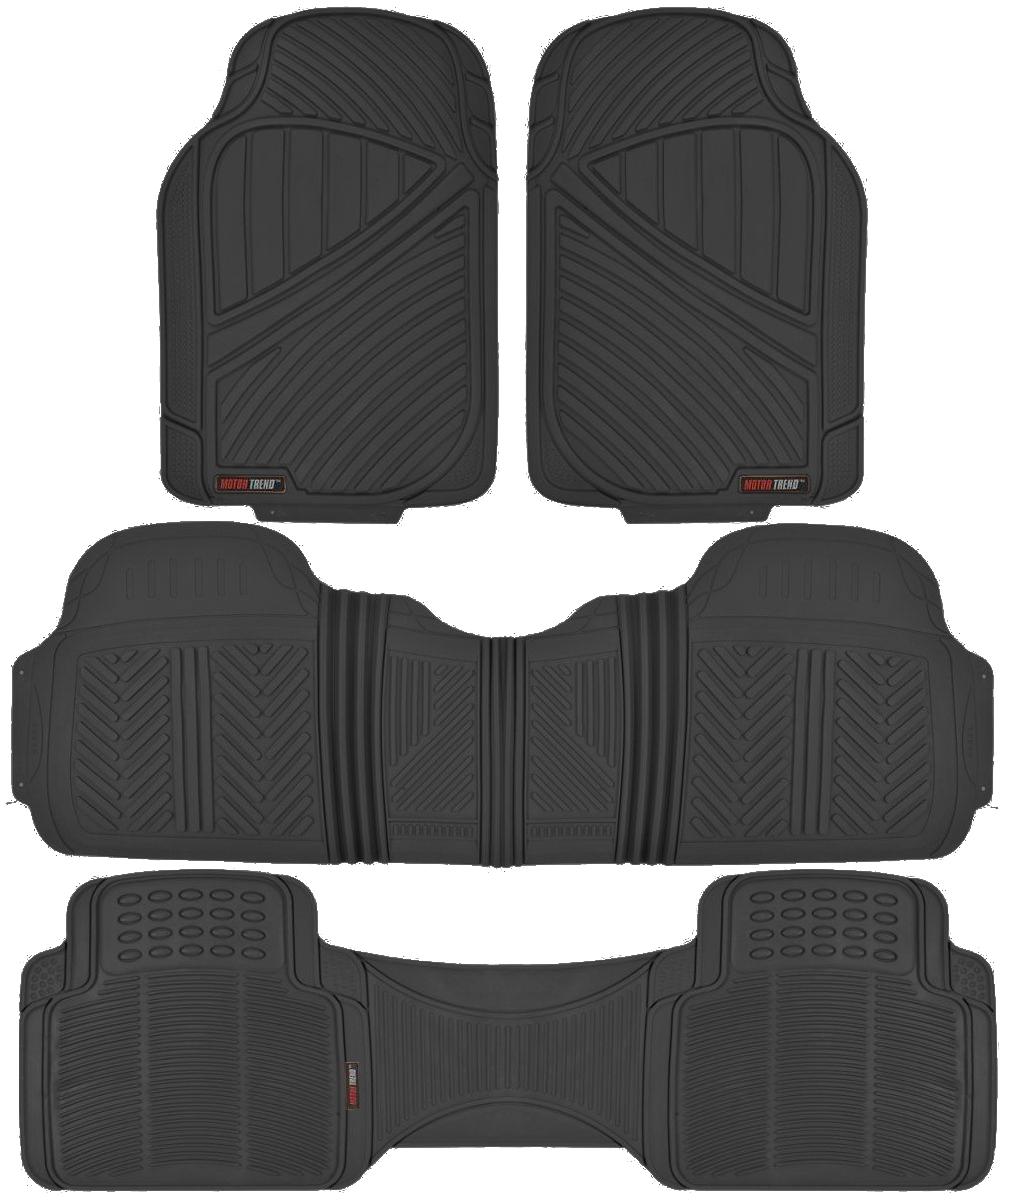 Motor Trend Max-Duty Van Truck Floor Mats Black Odorless All Weather Full Set